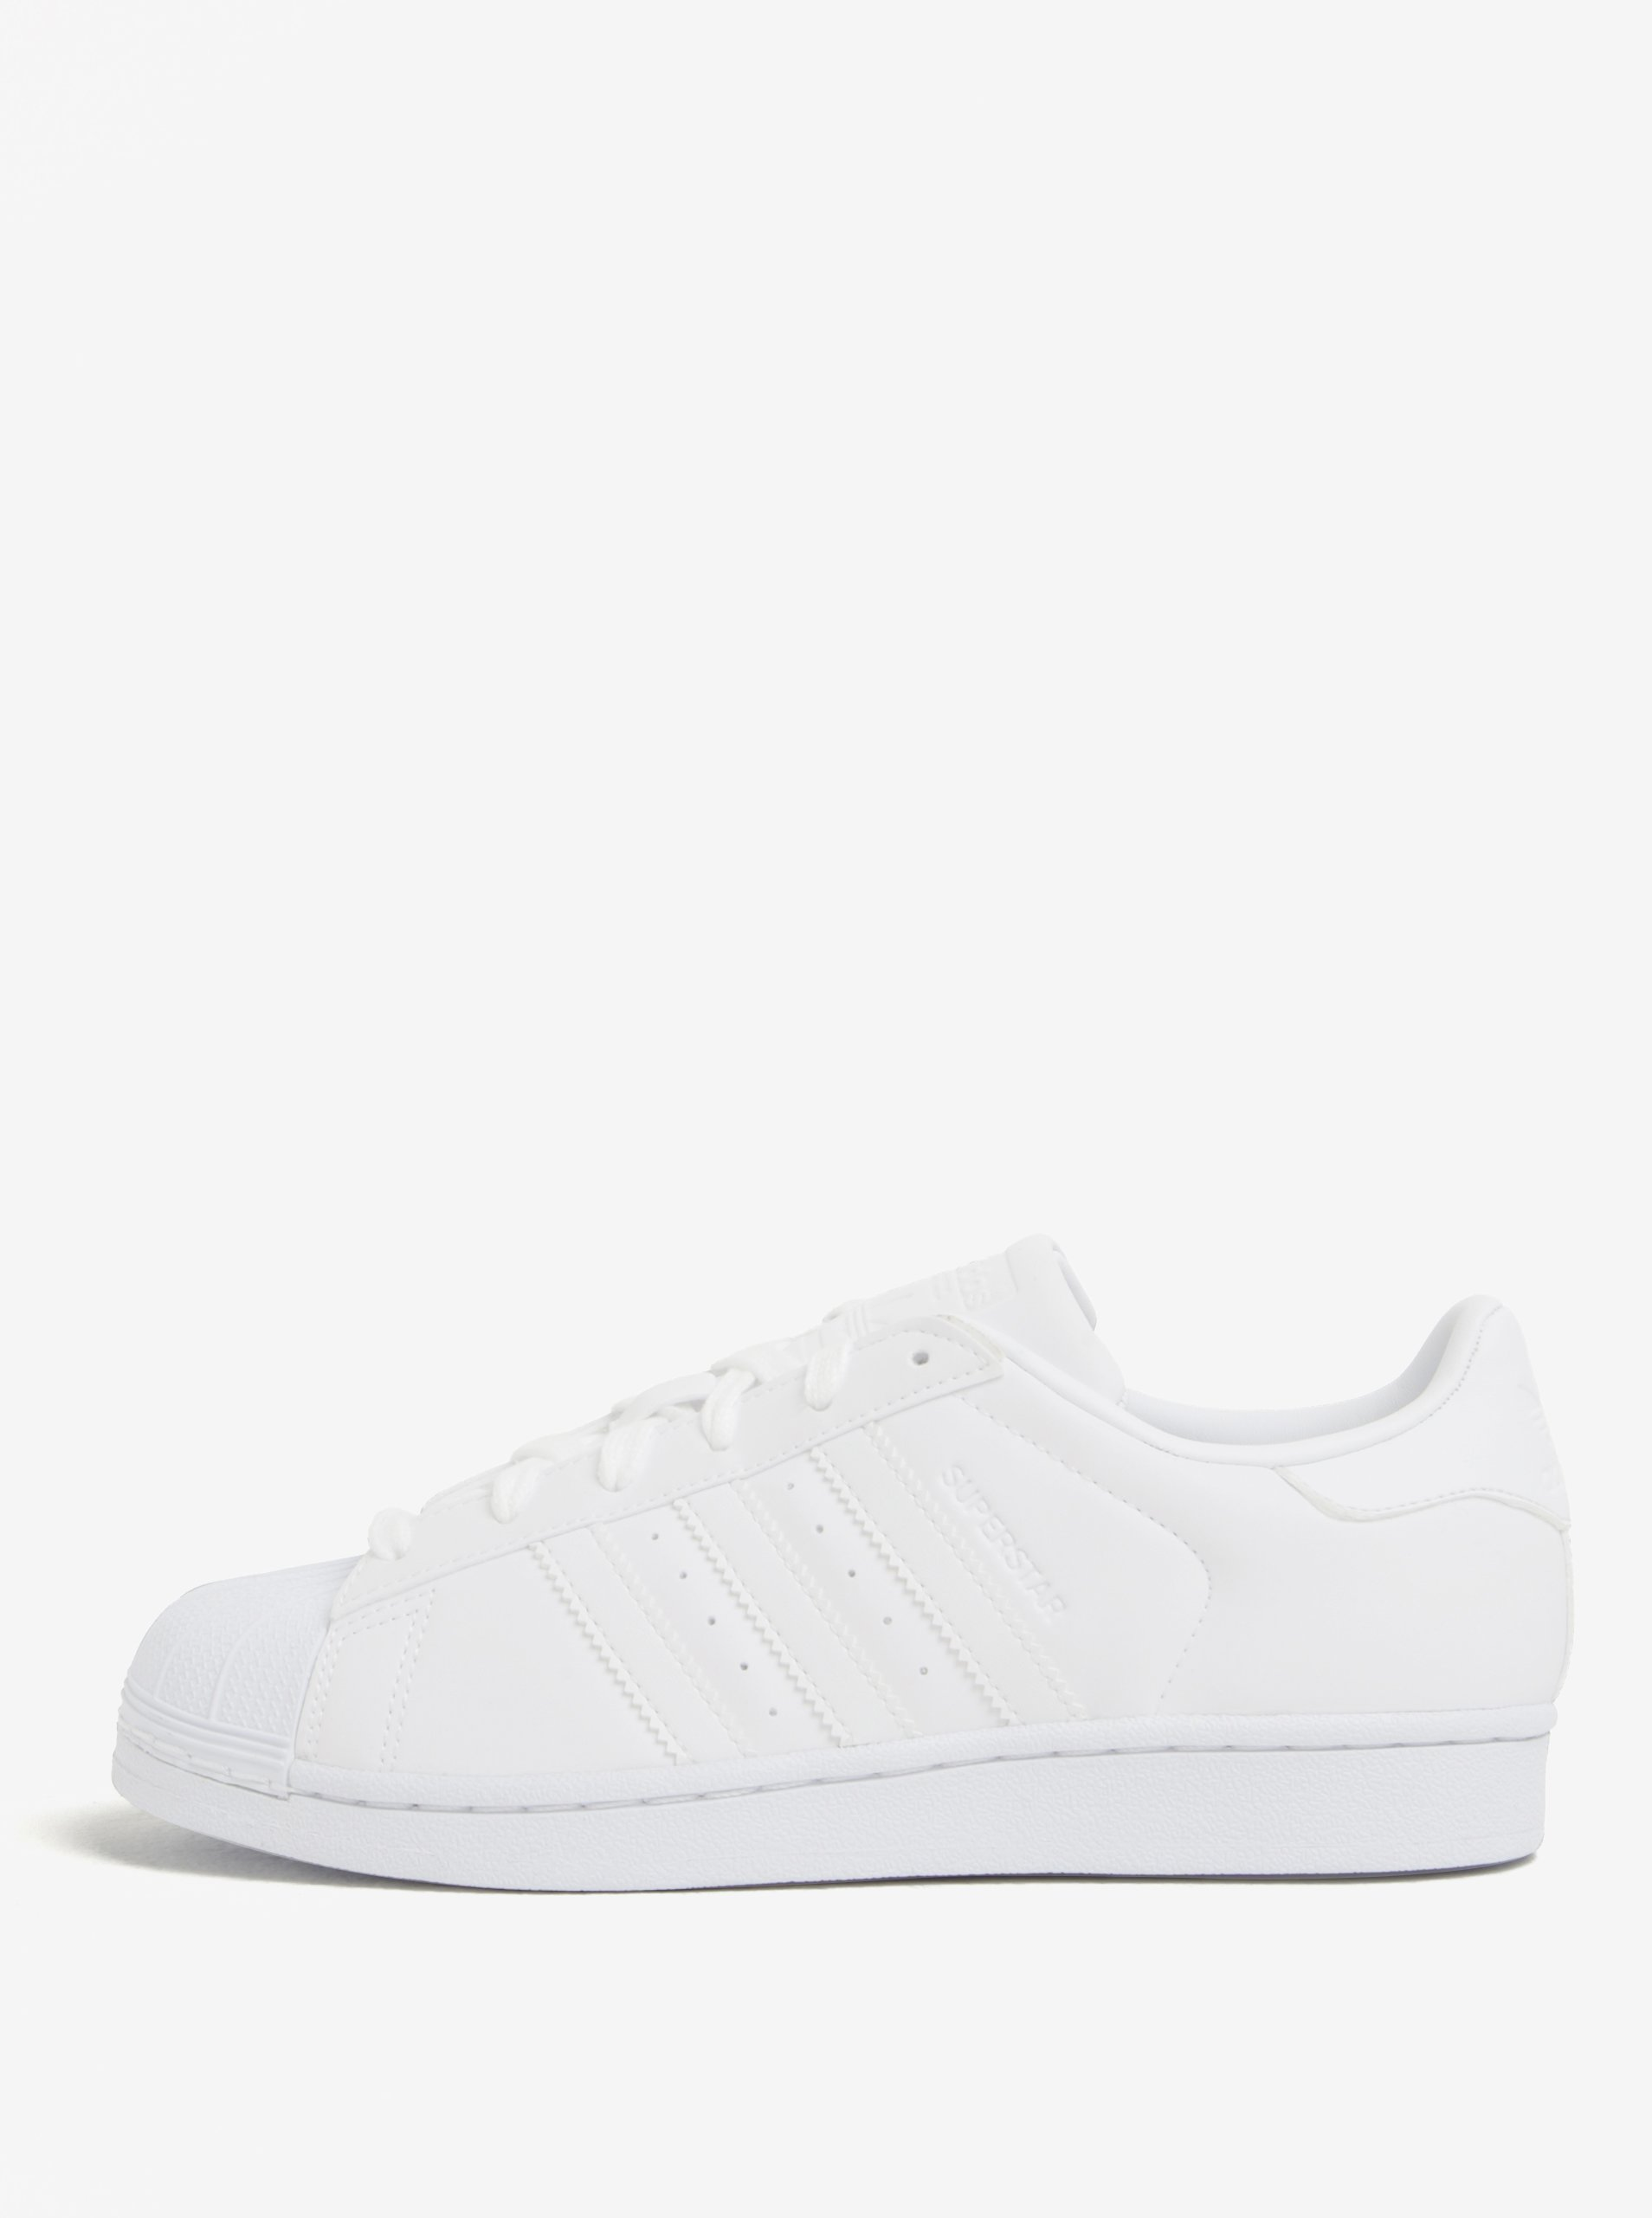 8d6410f20477 Biele dámske tenisky adidas Originals Superstar